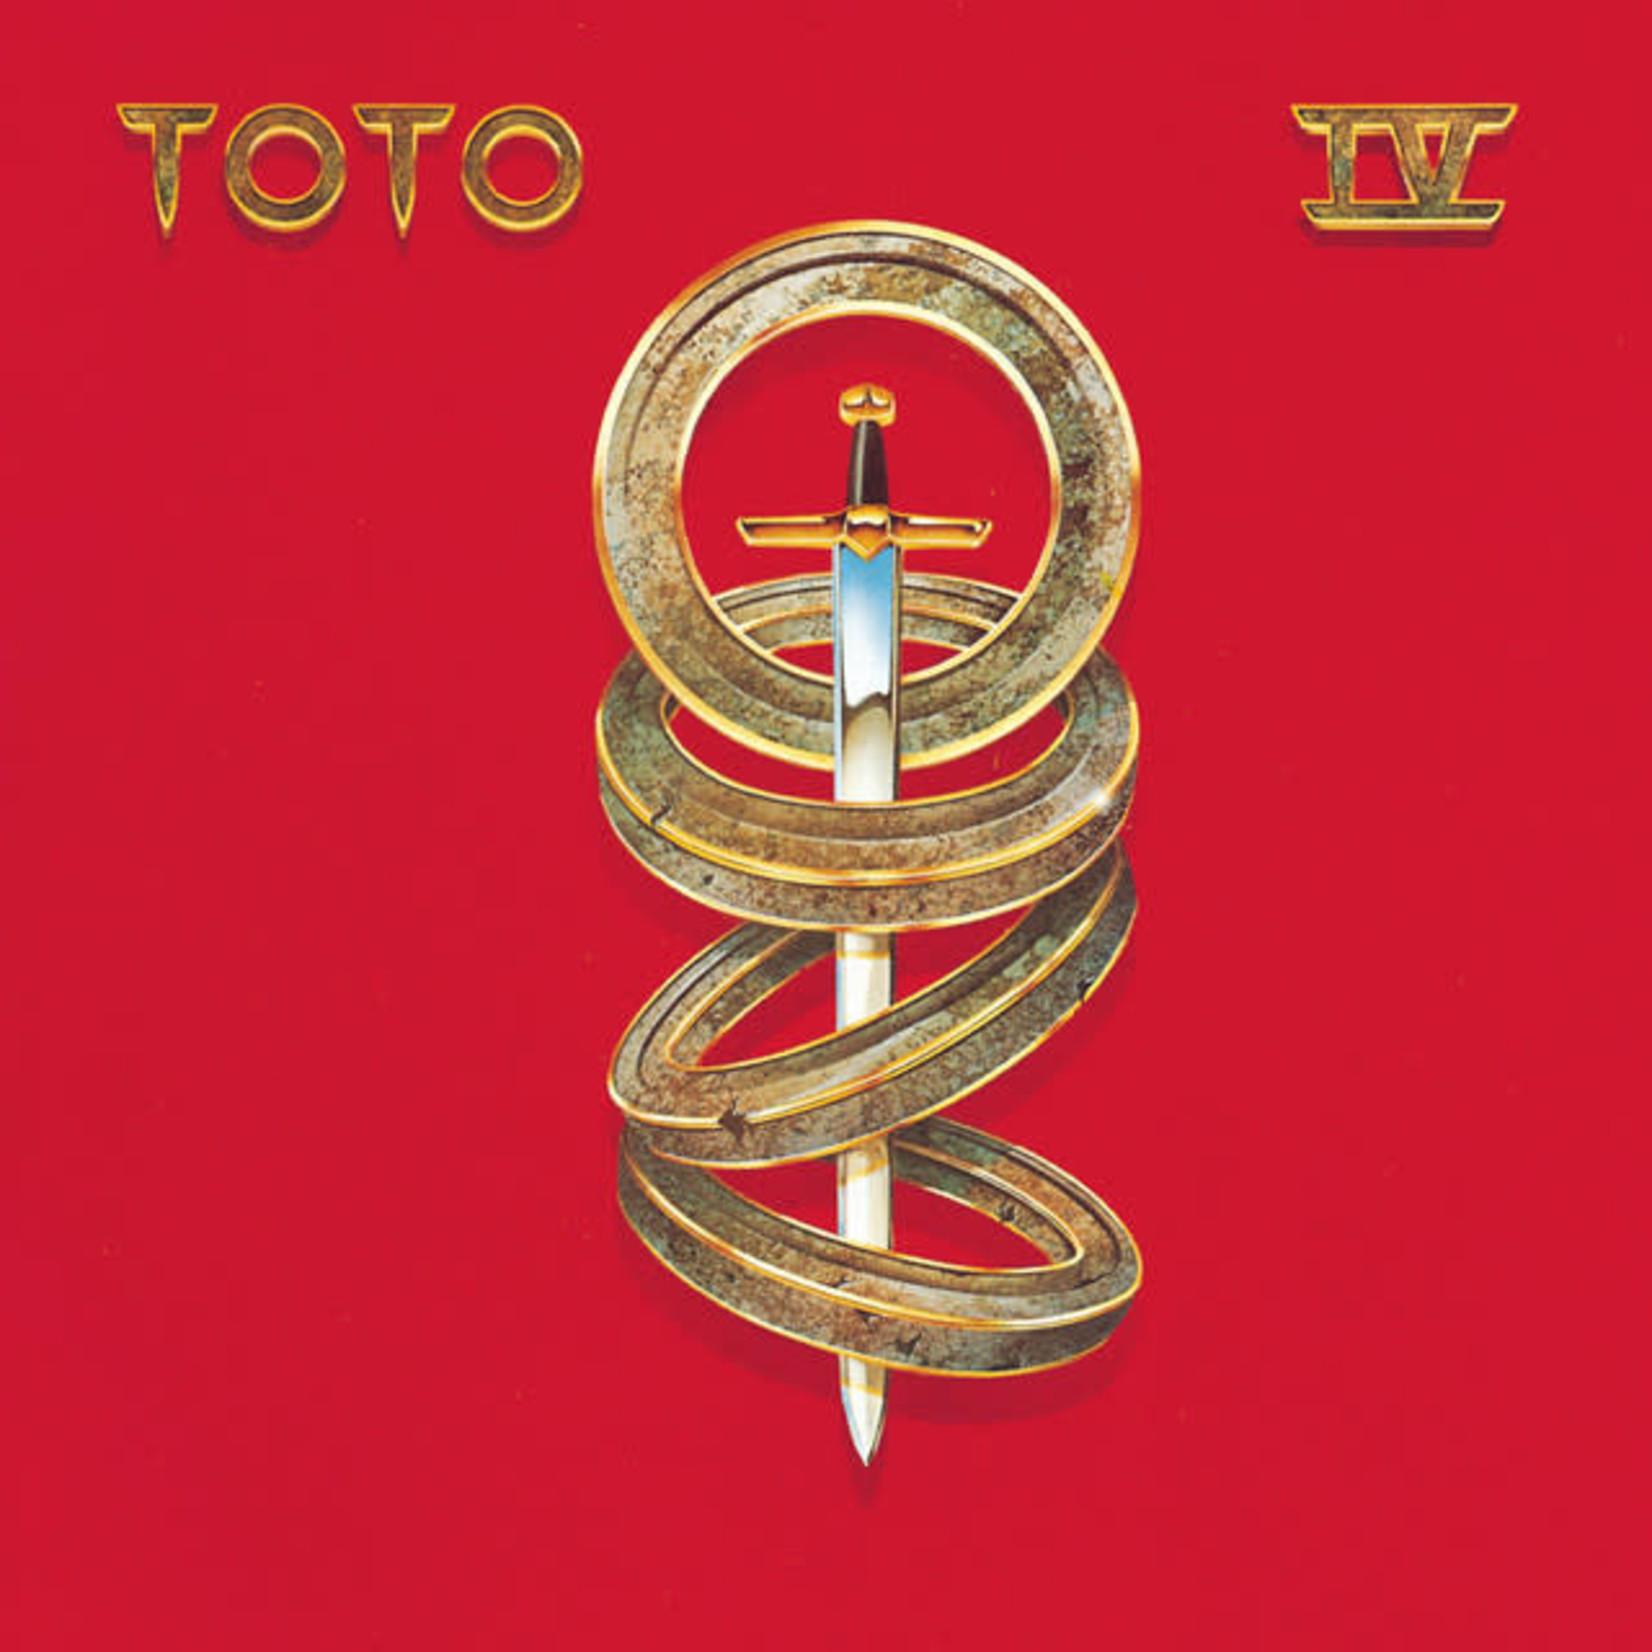 Vinyl Toto - IV